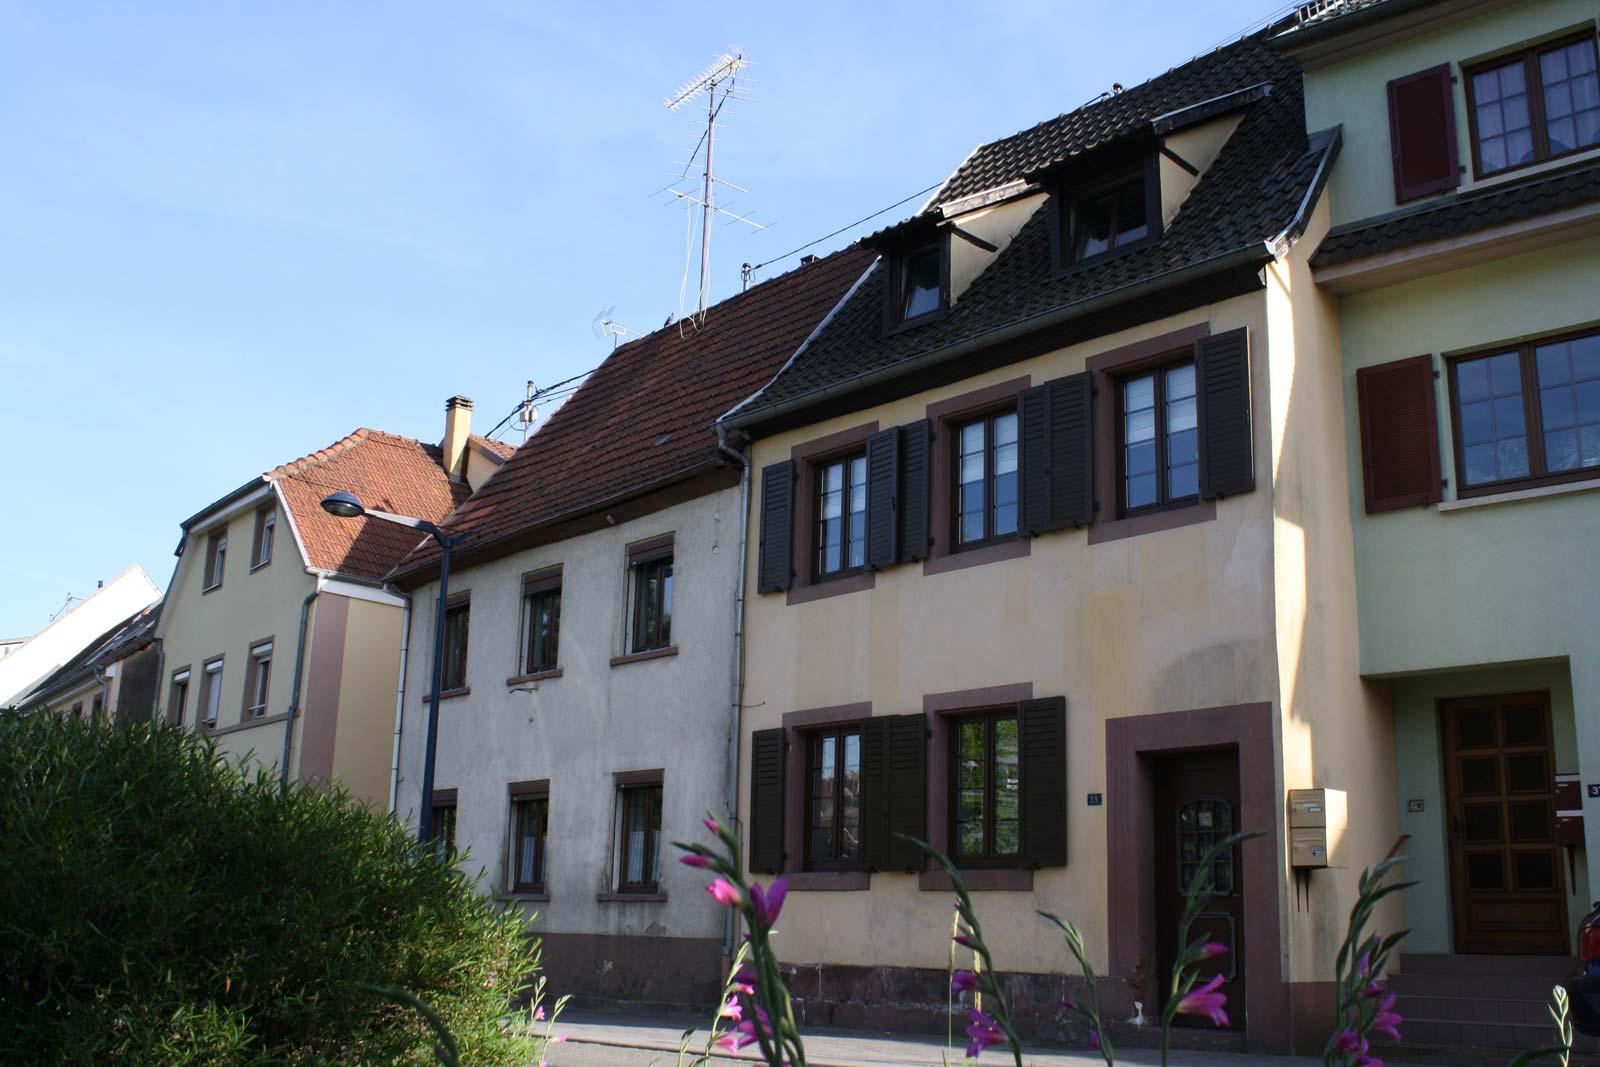 Meublé de Mme Gambs, Niederbronn-les-Bains, Alsace